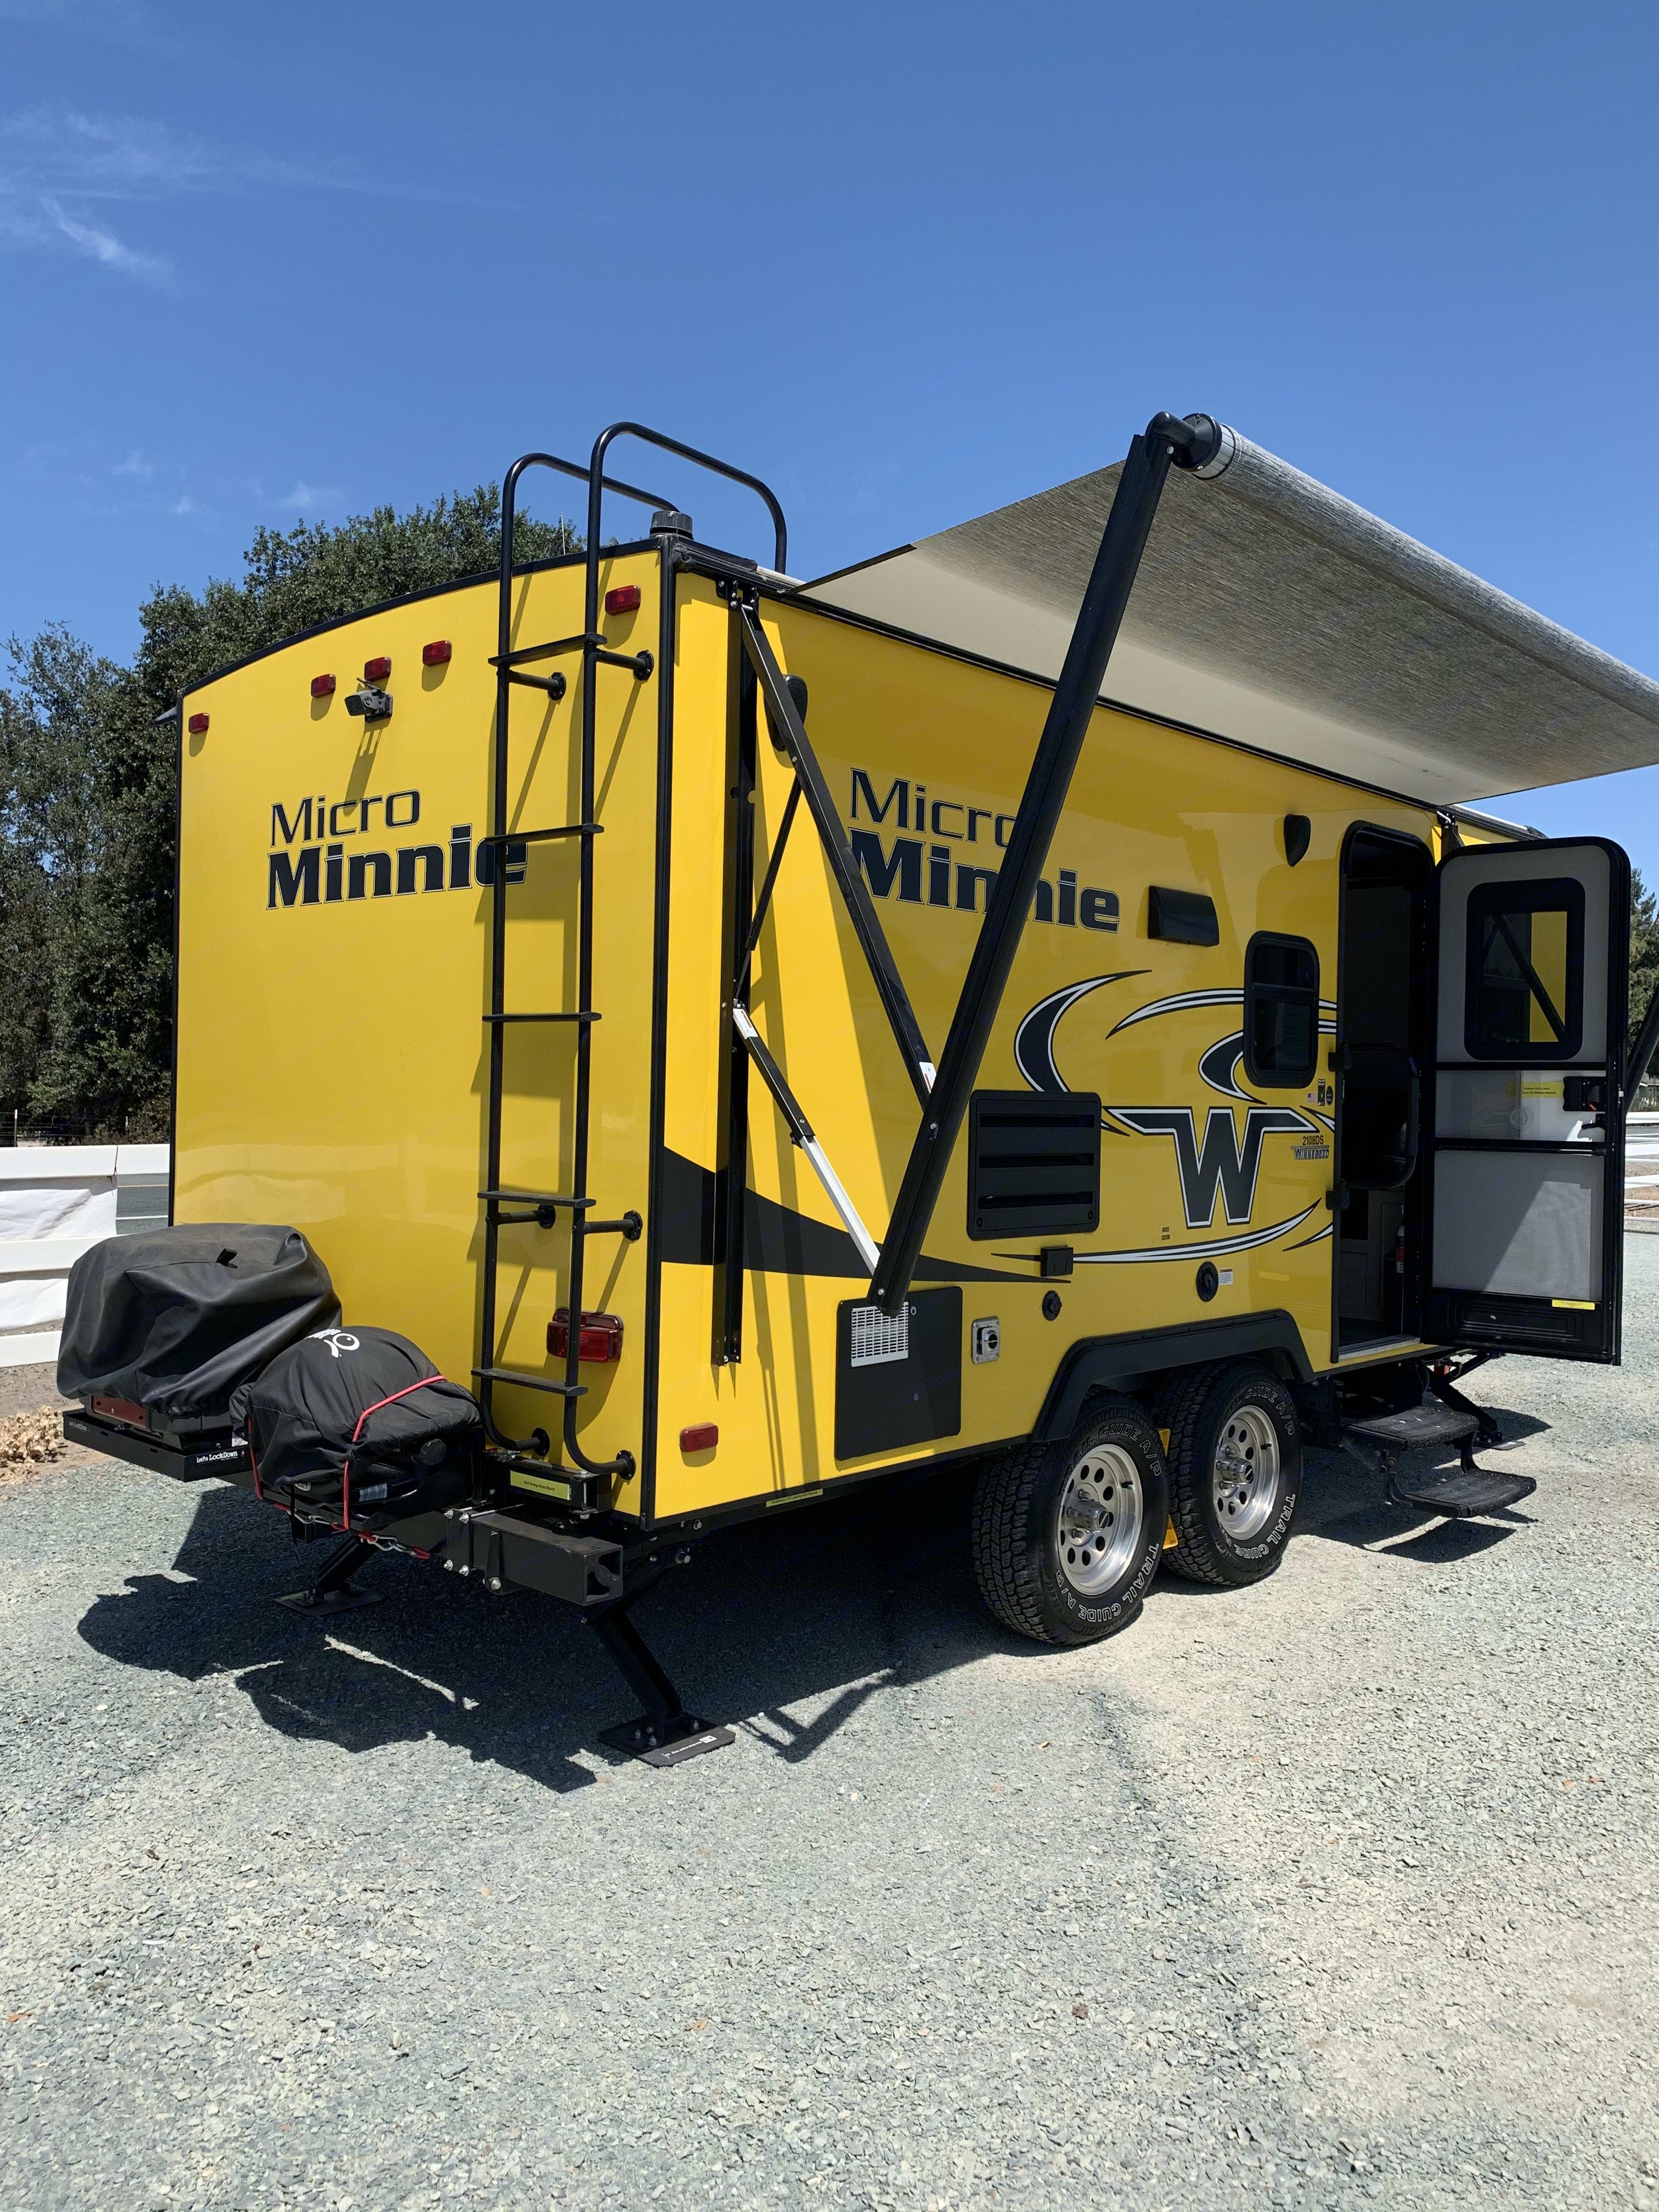 Awning is half way out. Winnebago Micro Minnie 2019